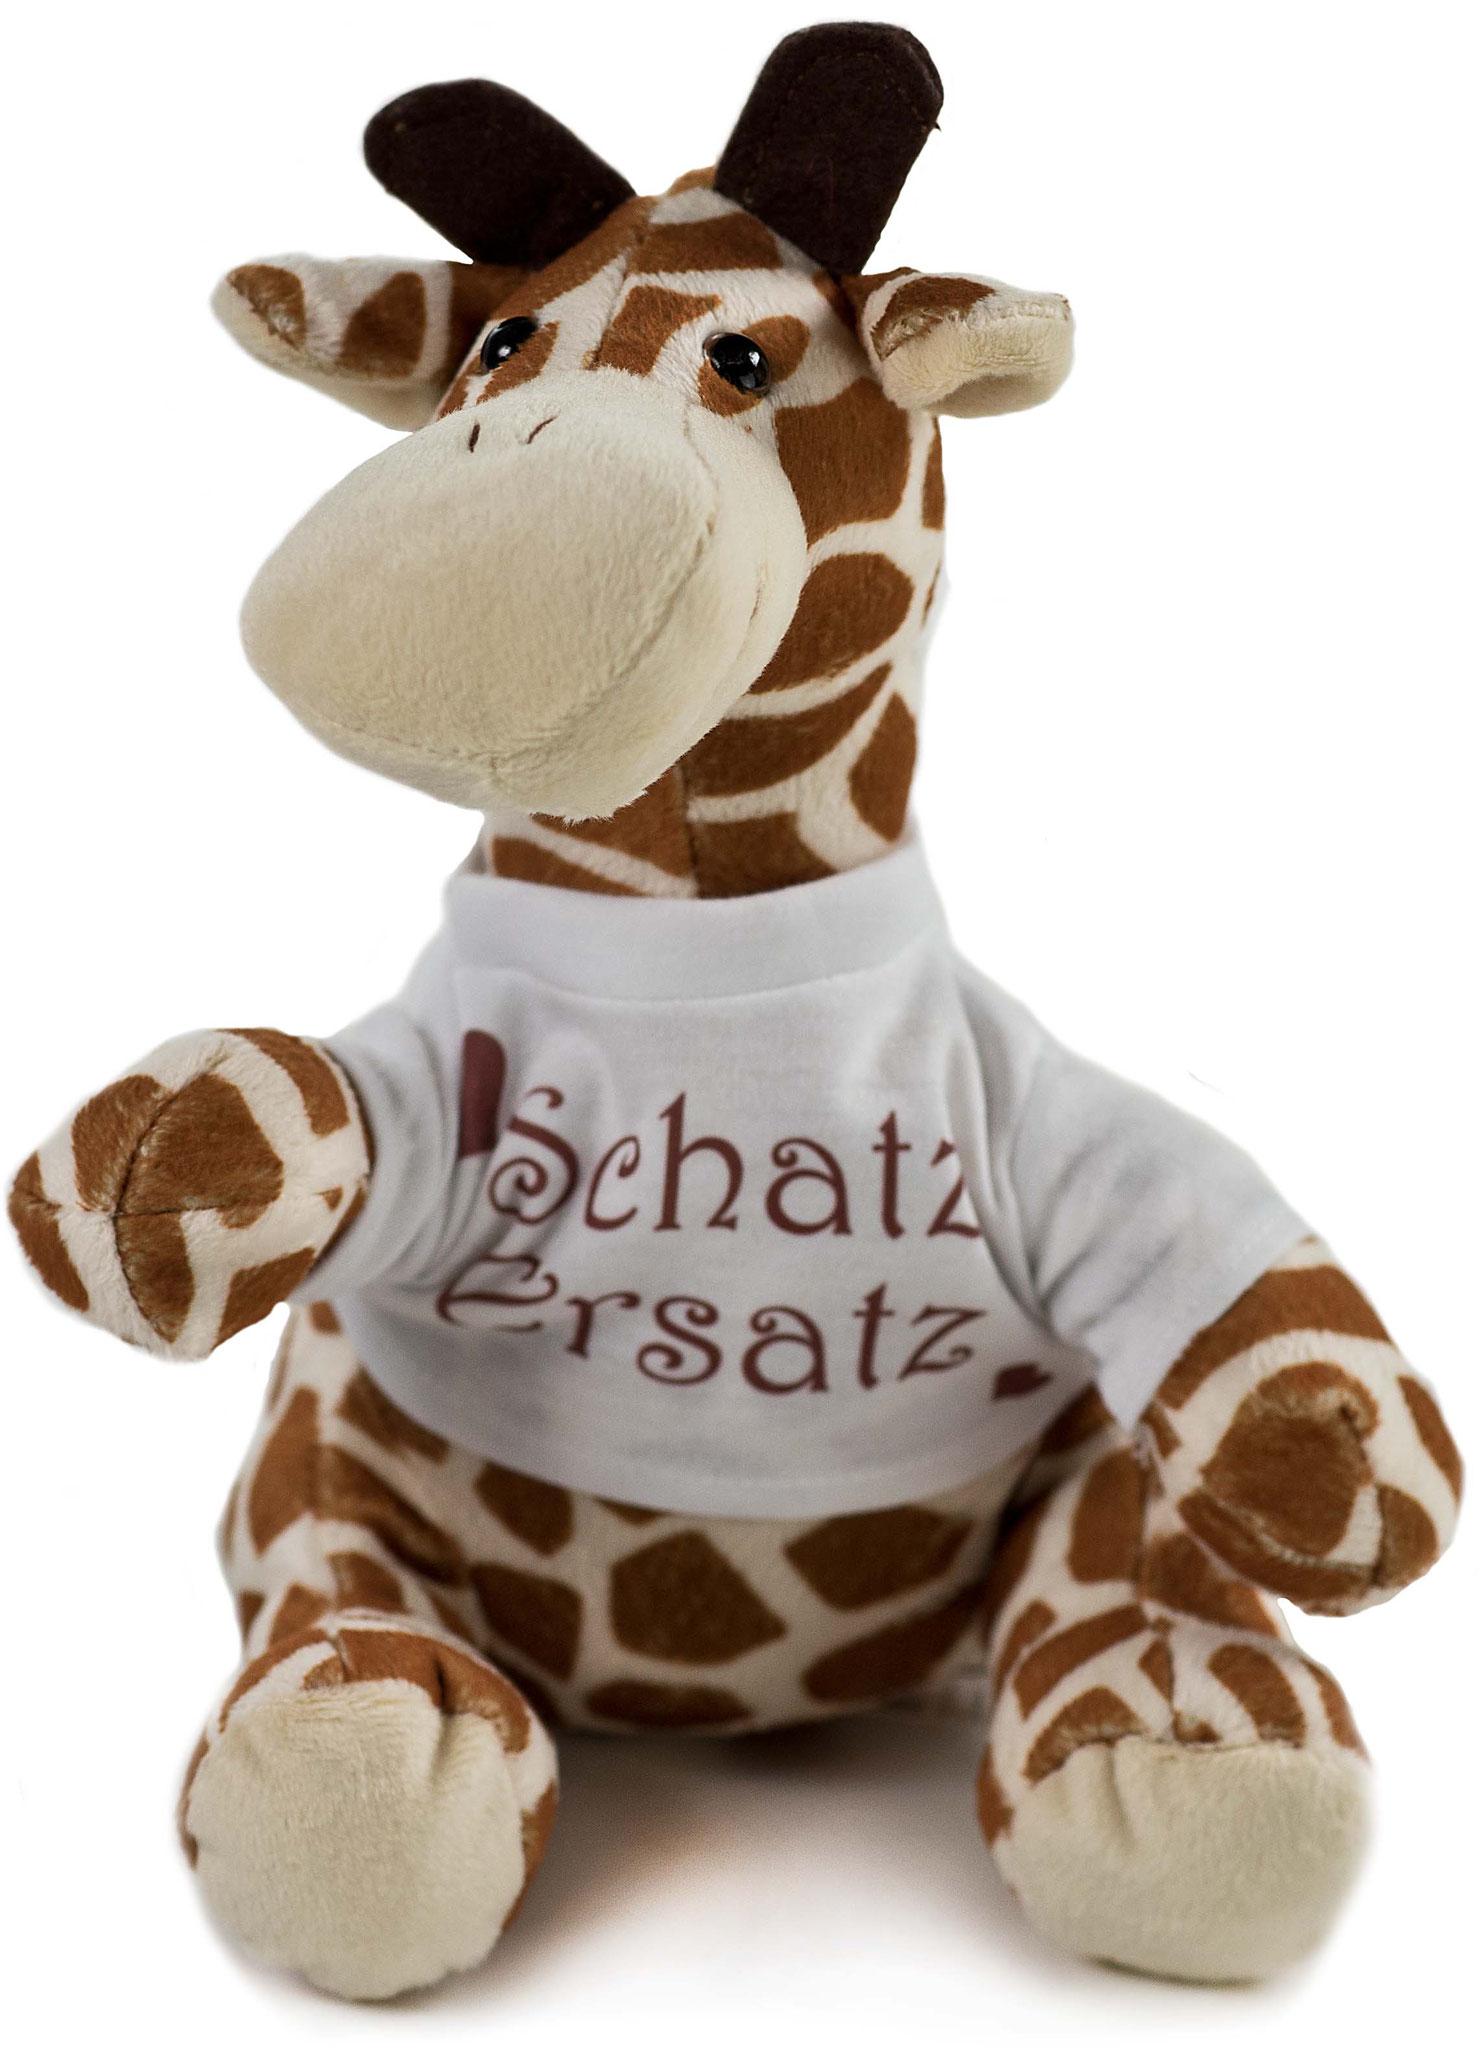 die Giraffe Mona